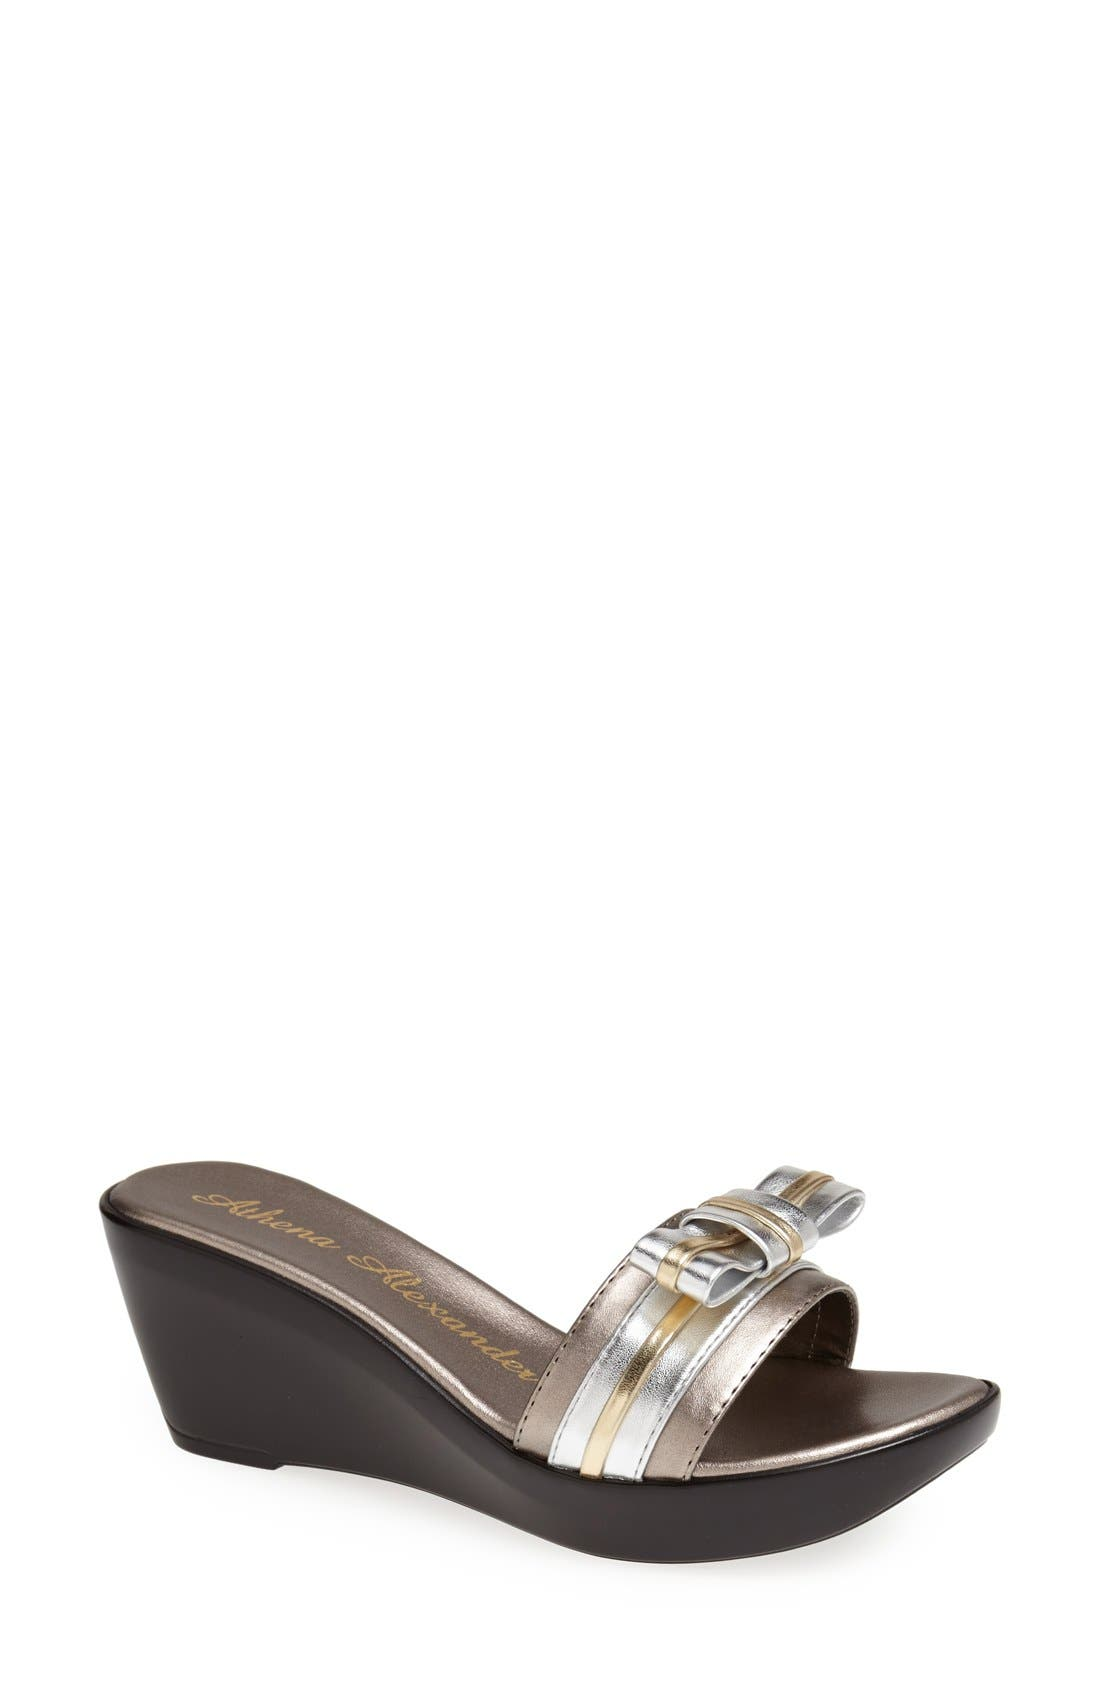 Main Image - Athena Alexander 'Salty' Sandal (Women)